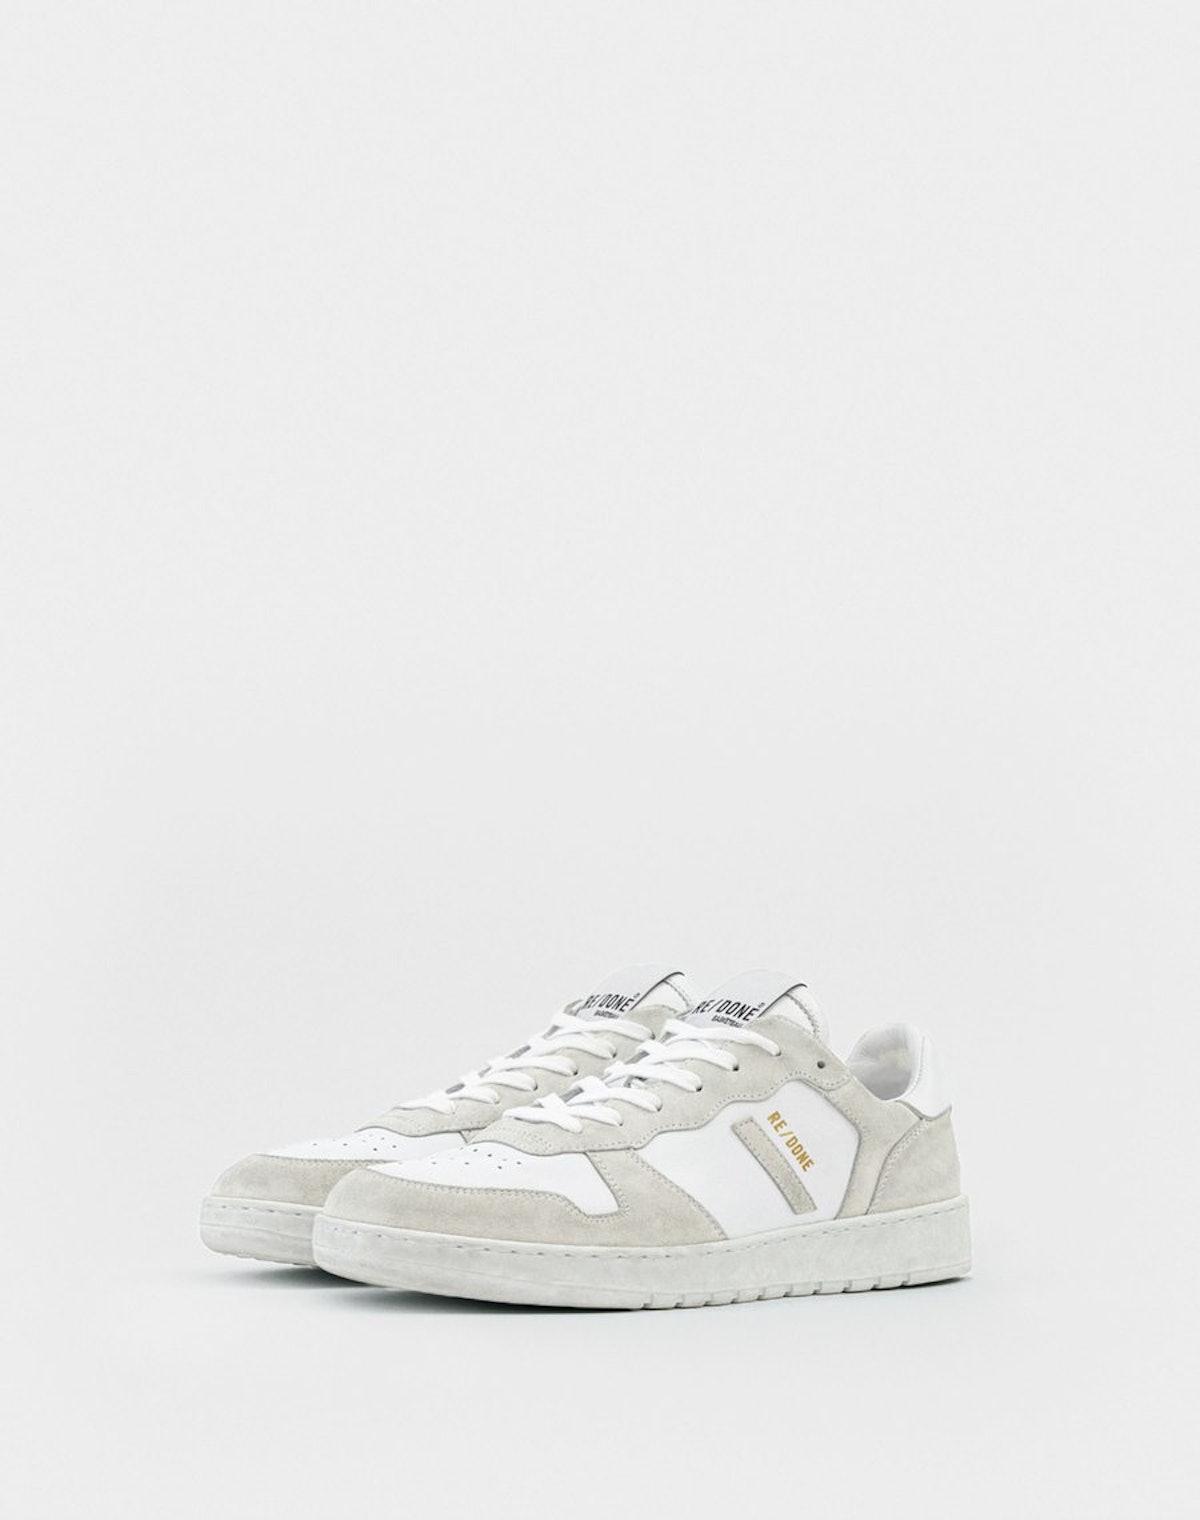 80s Basketball Shoe